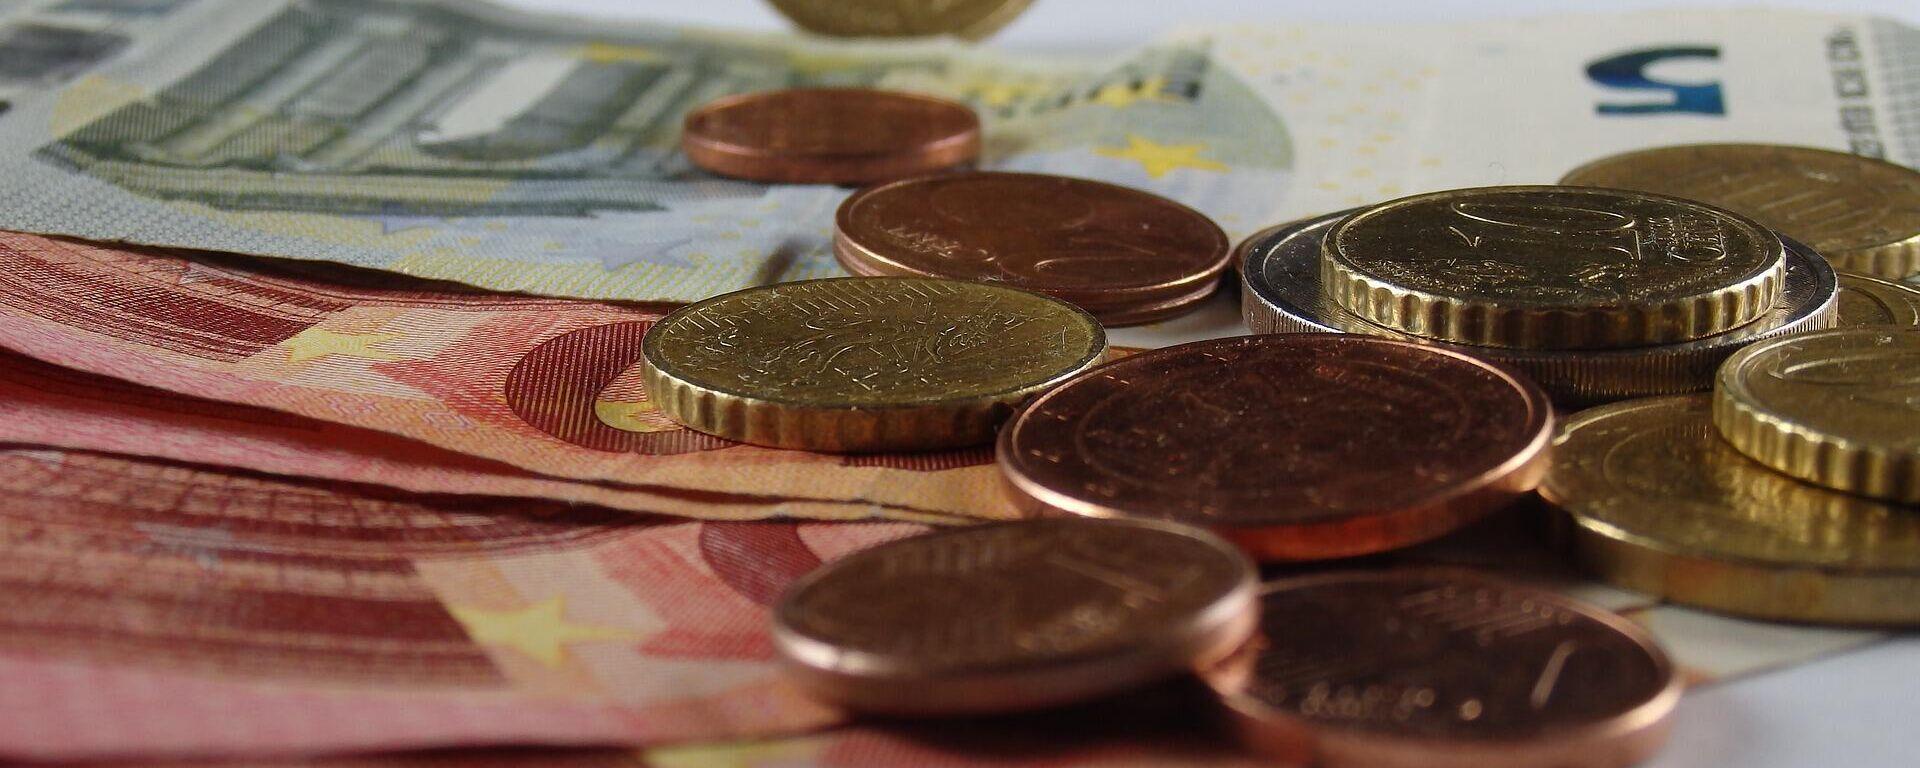 Geld (Symbolbild) - SNA, 1920, 10.07.2021